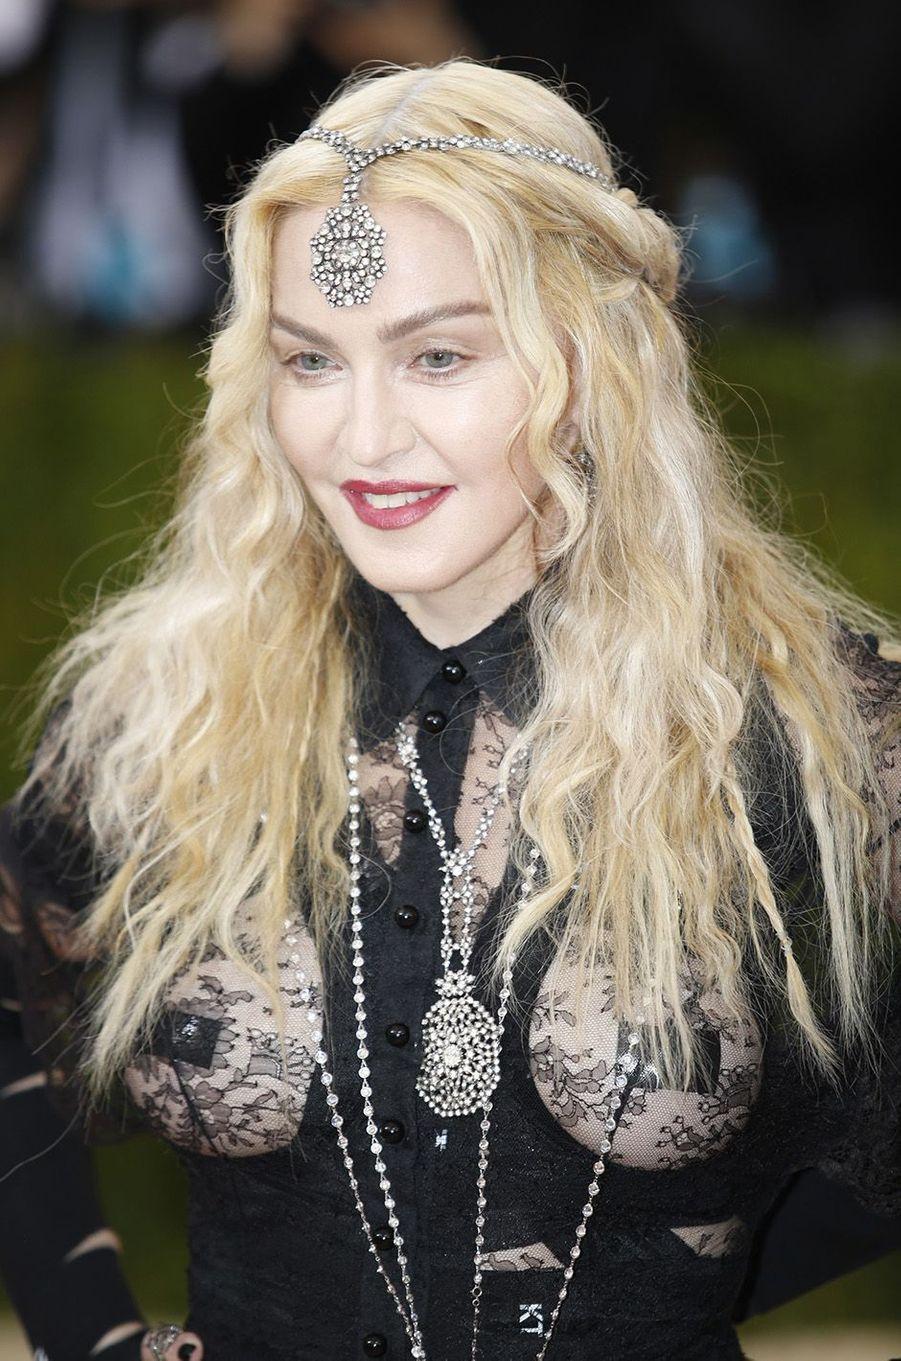 12. Madonna